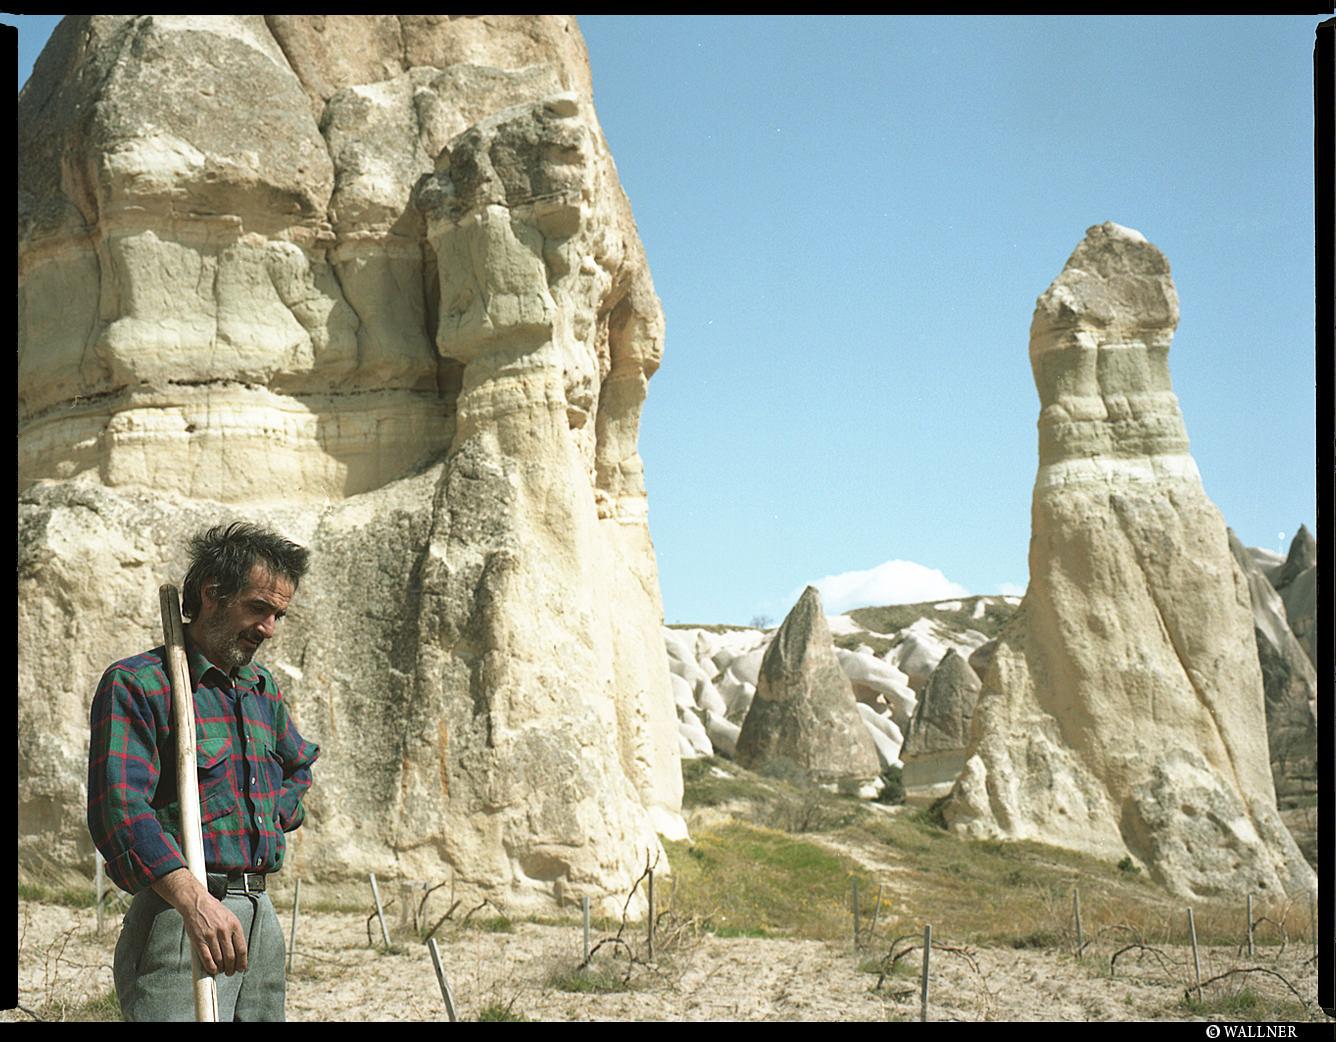 MediumFormatPatrikWallner_Cappadocia_Worker_LOWQ